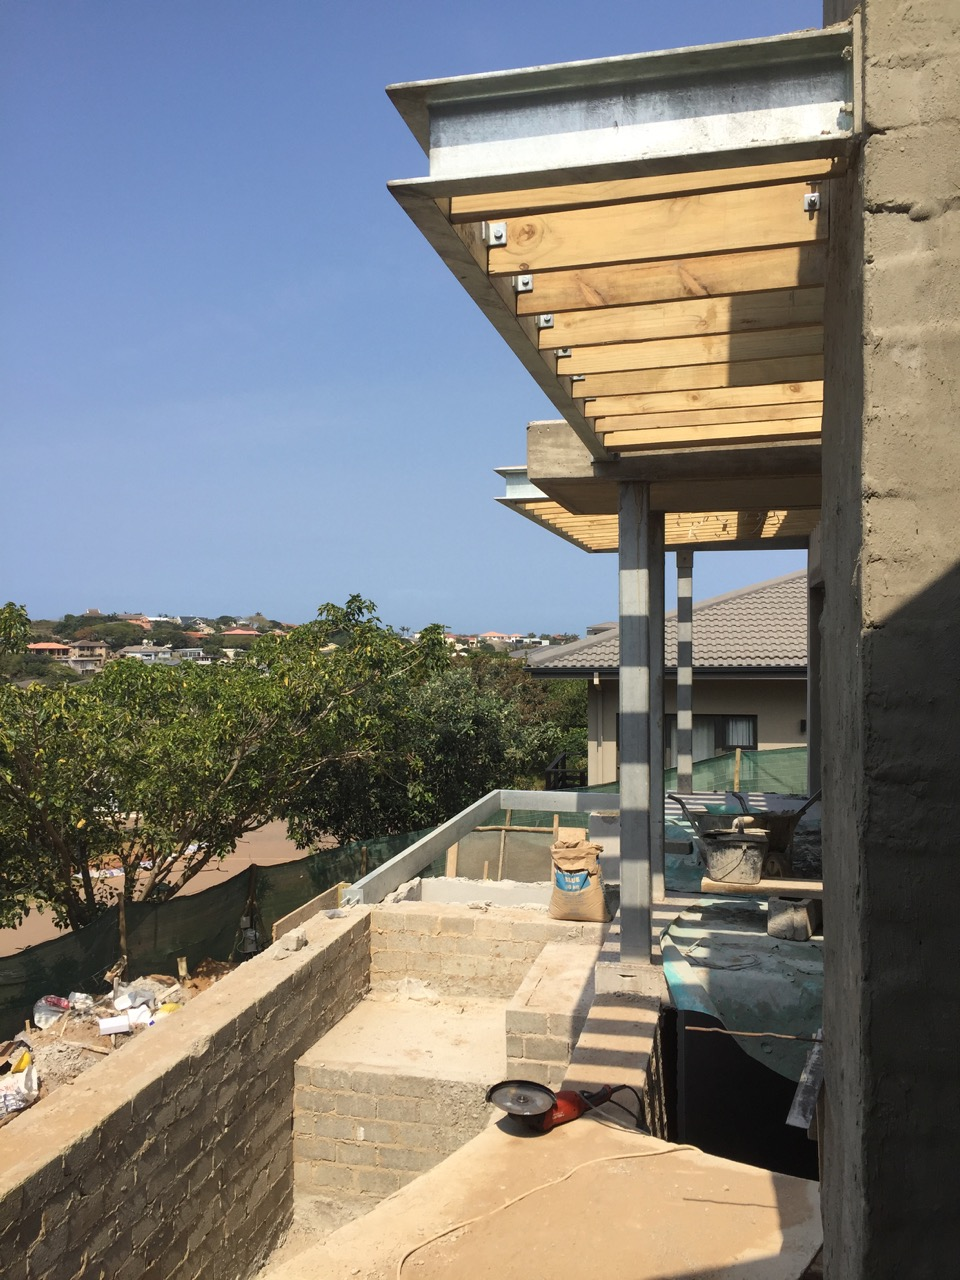 Pool - deck - pergola